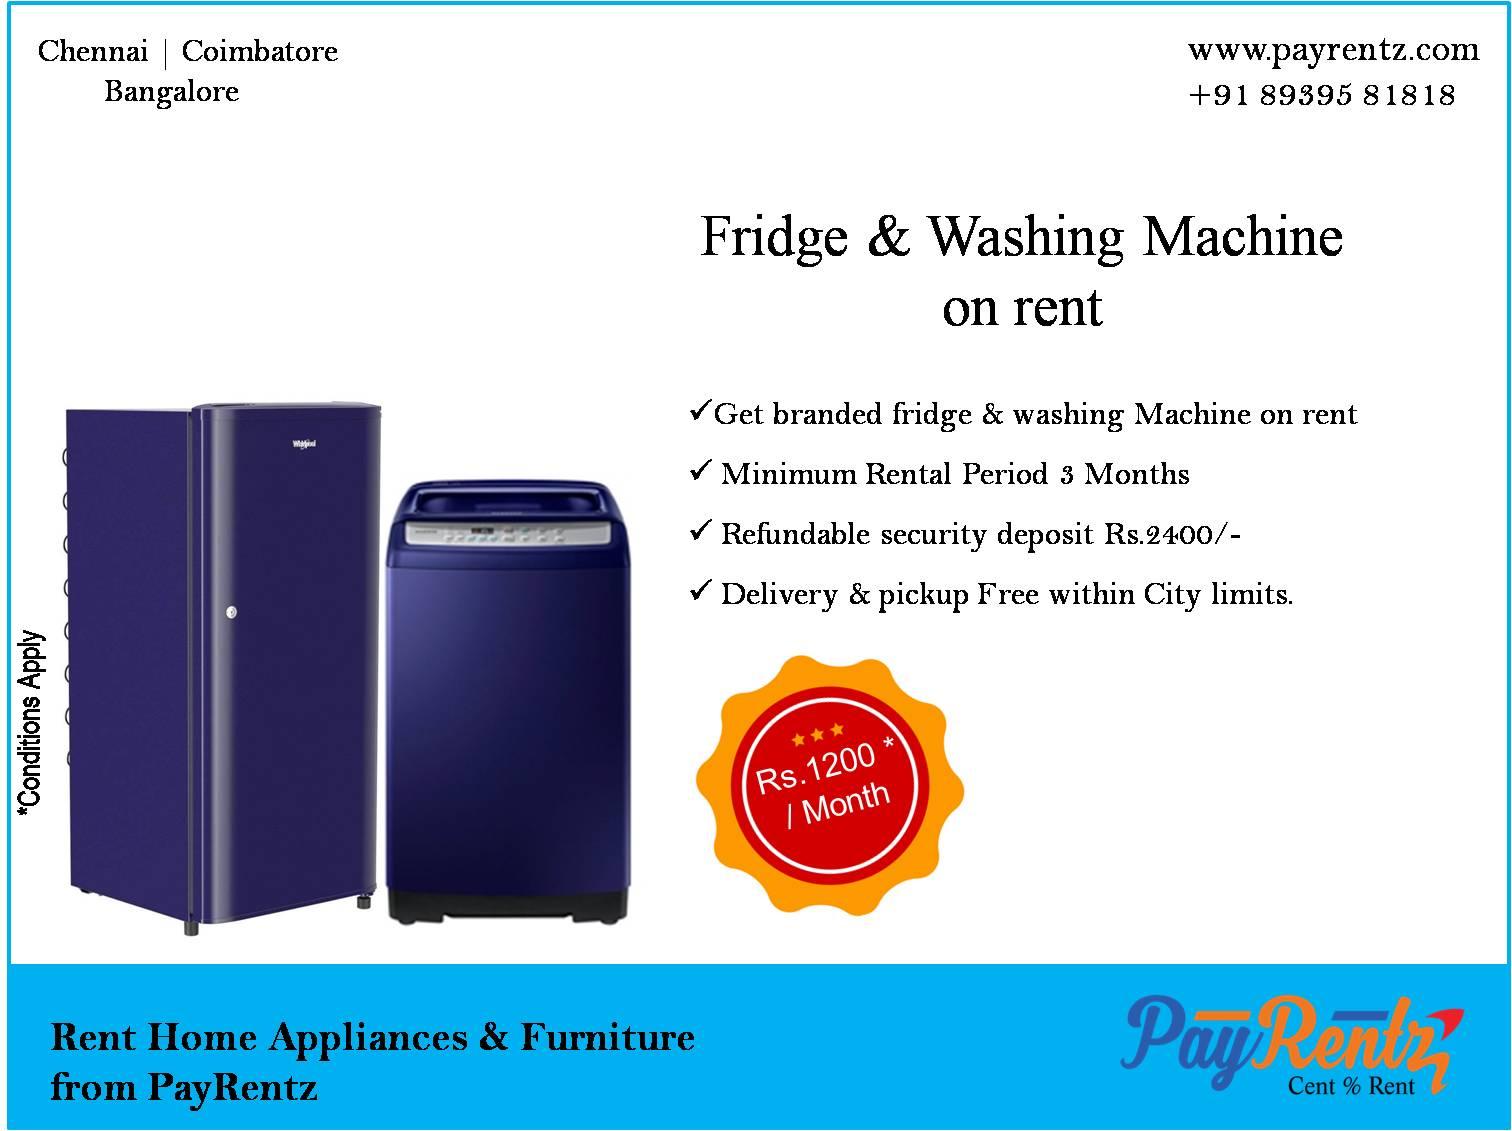 Small fridge, Top load washing Machine